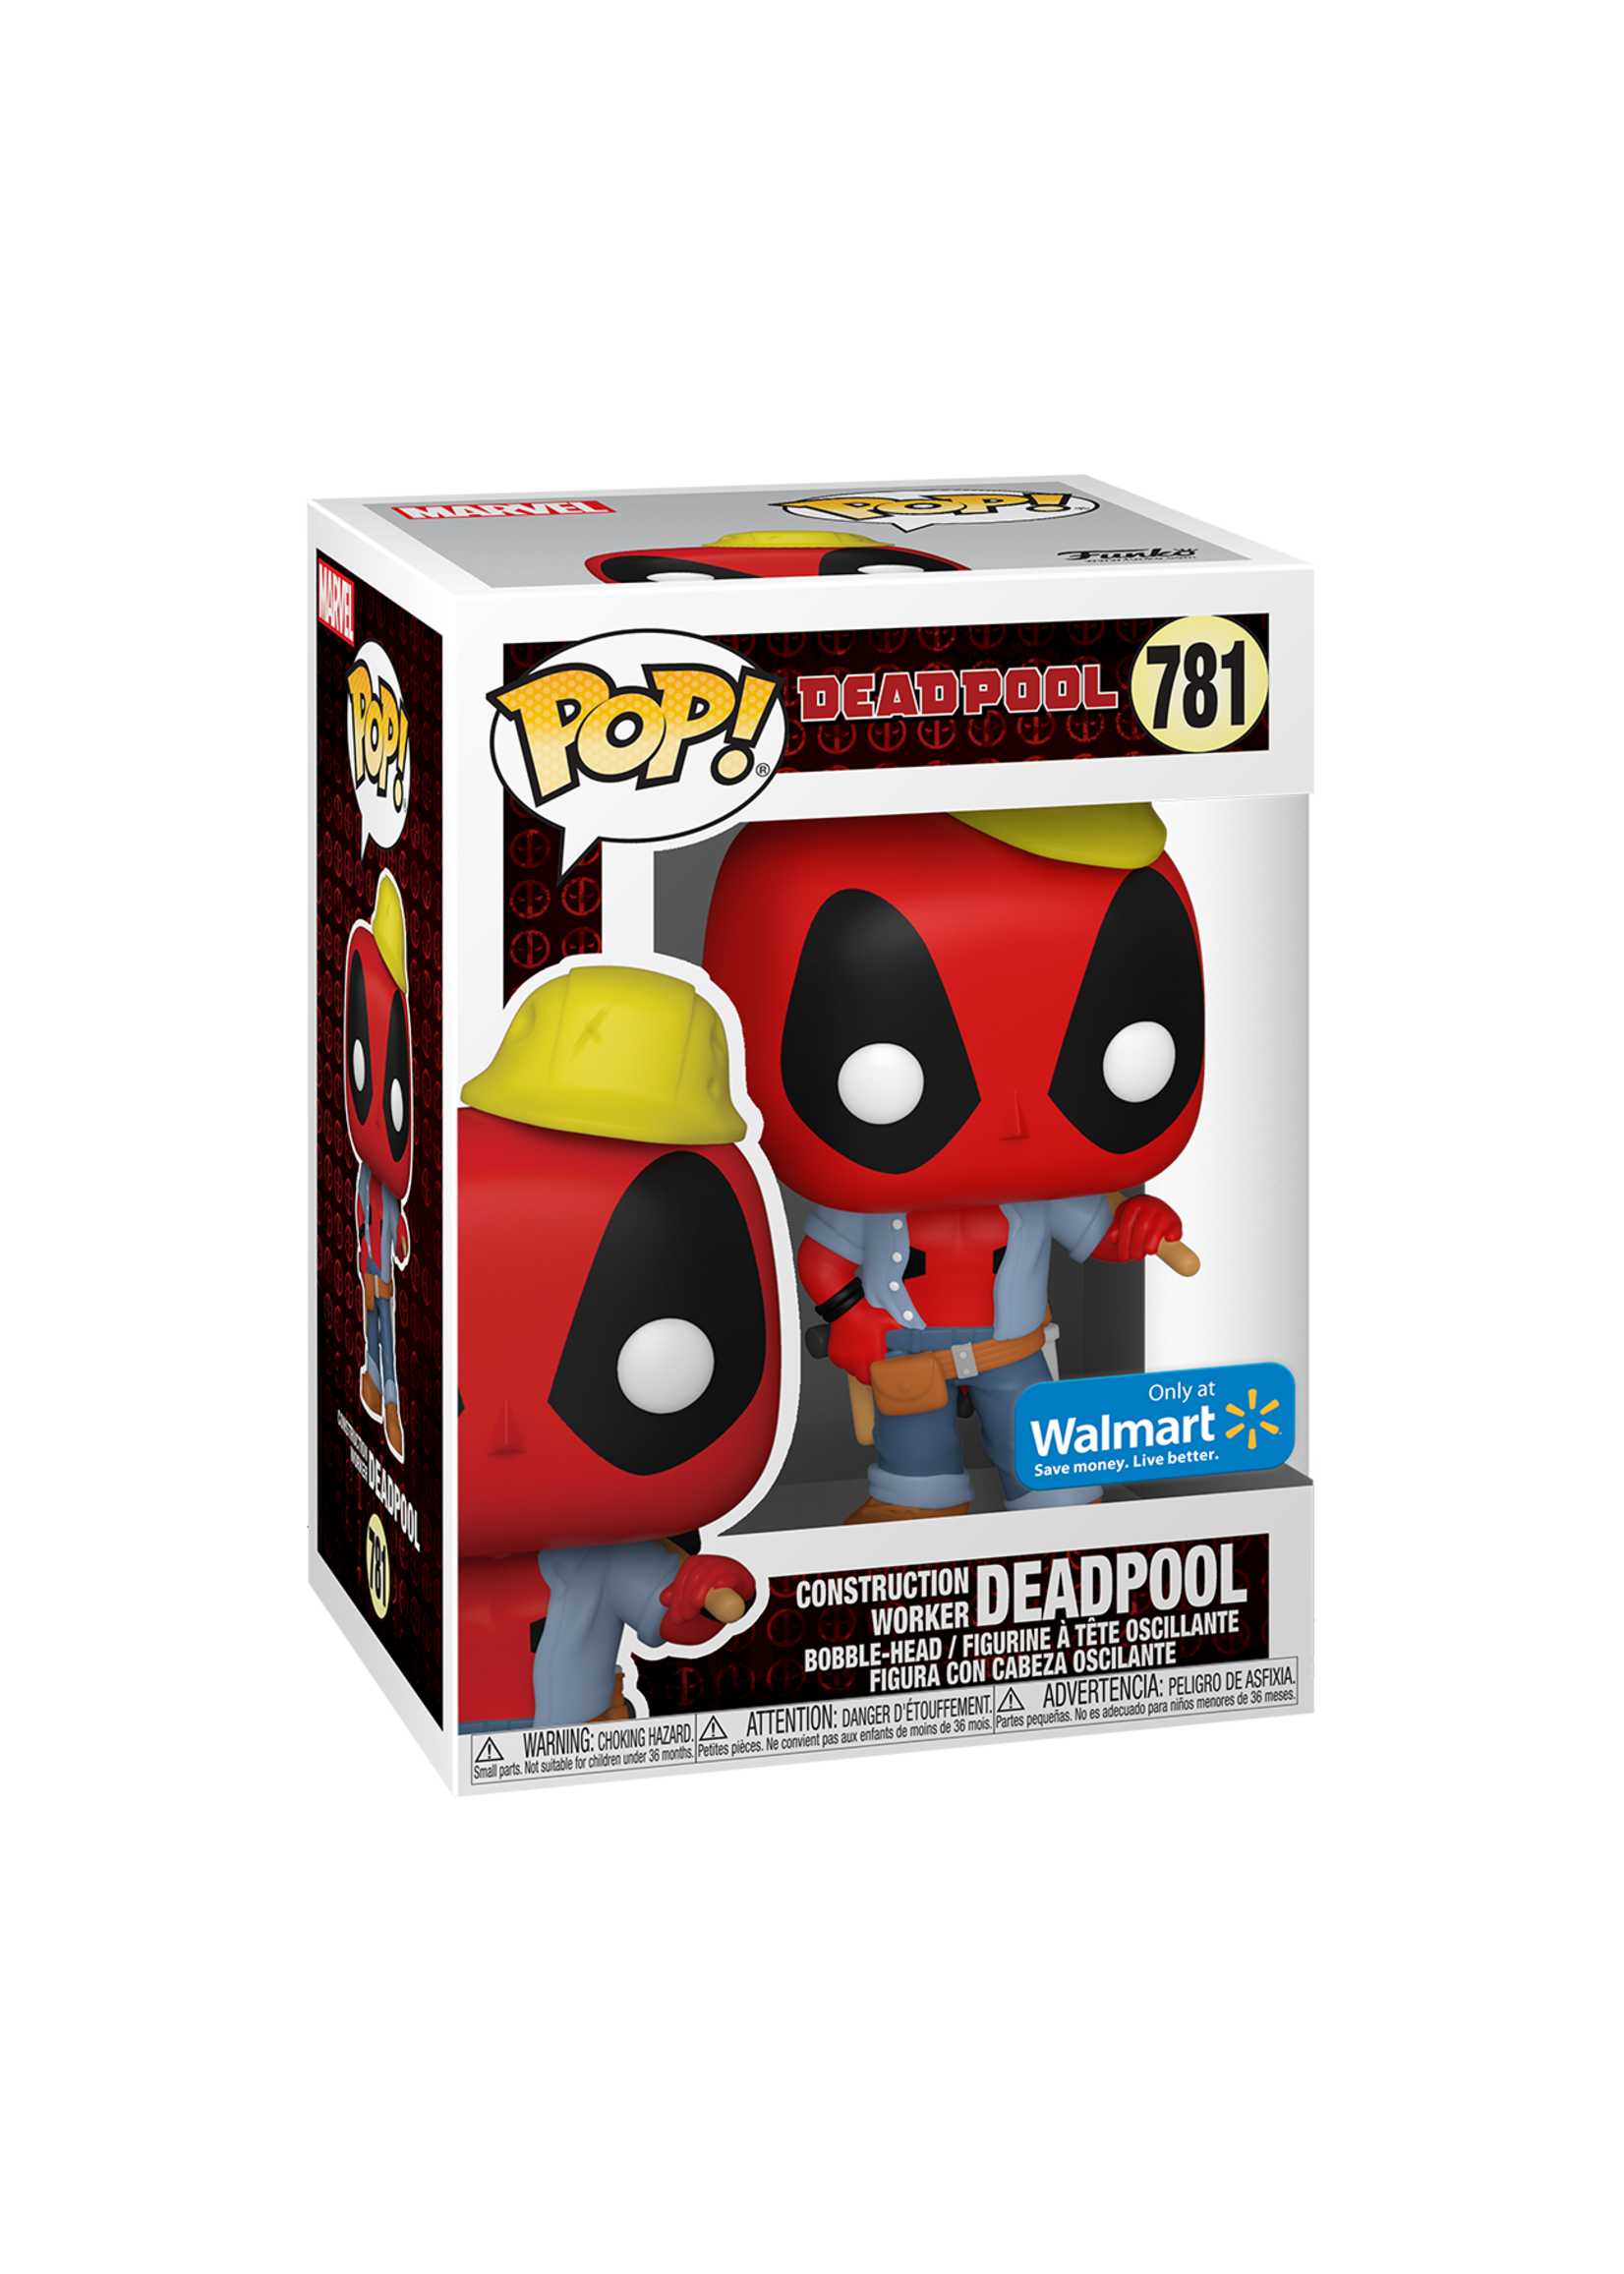 Construction Worker Deadpool Pop